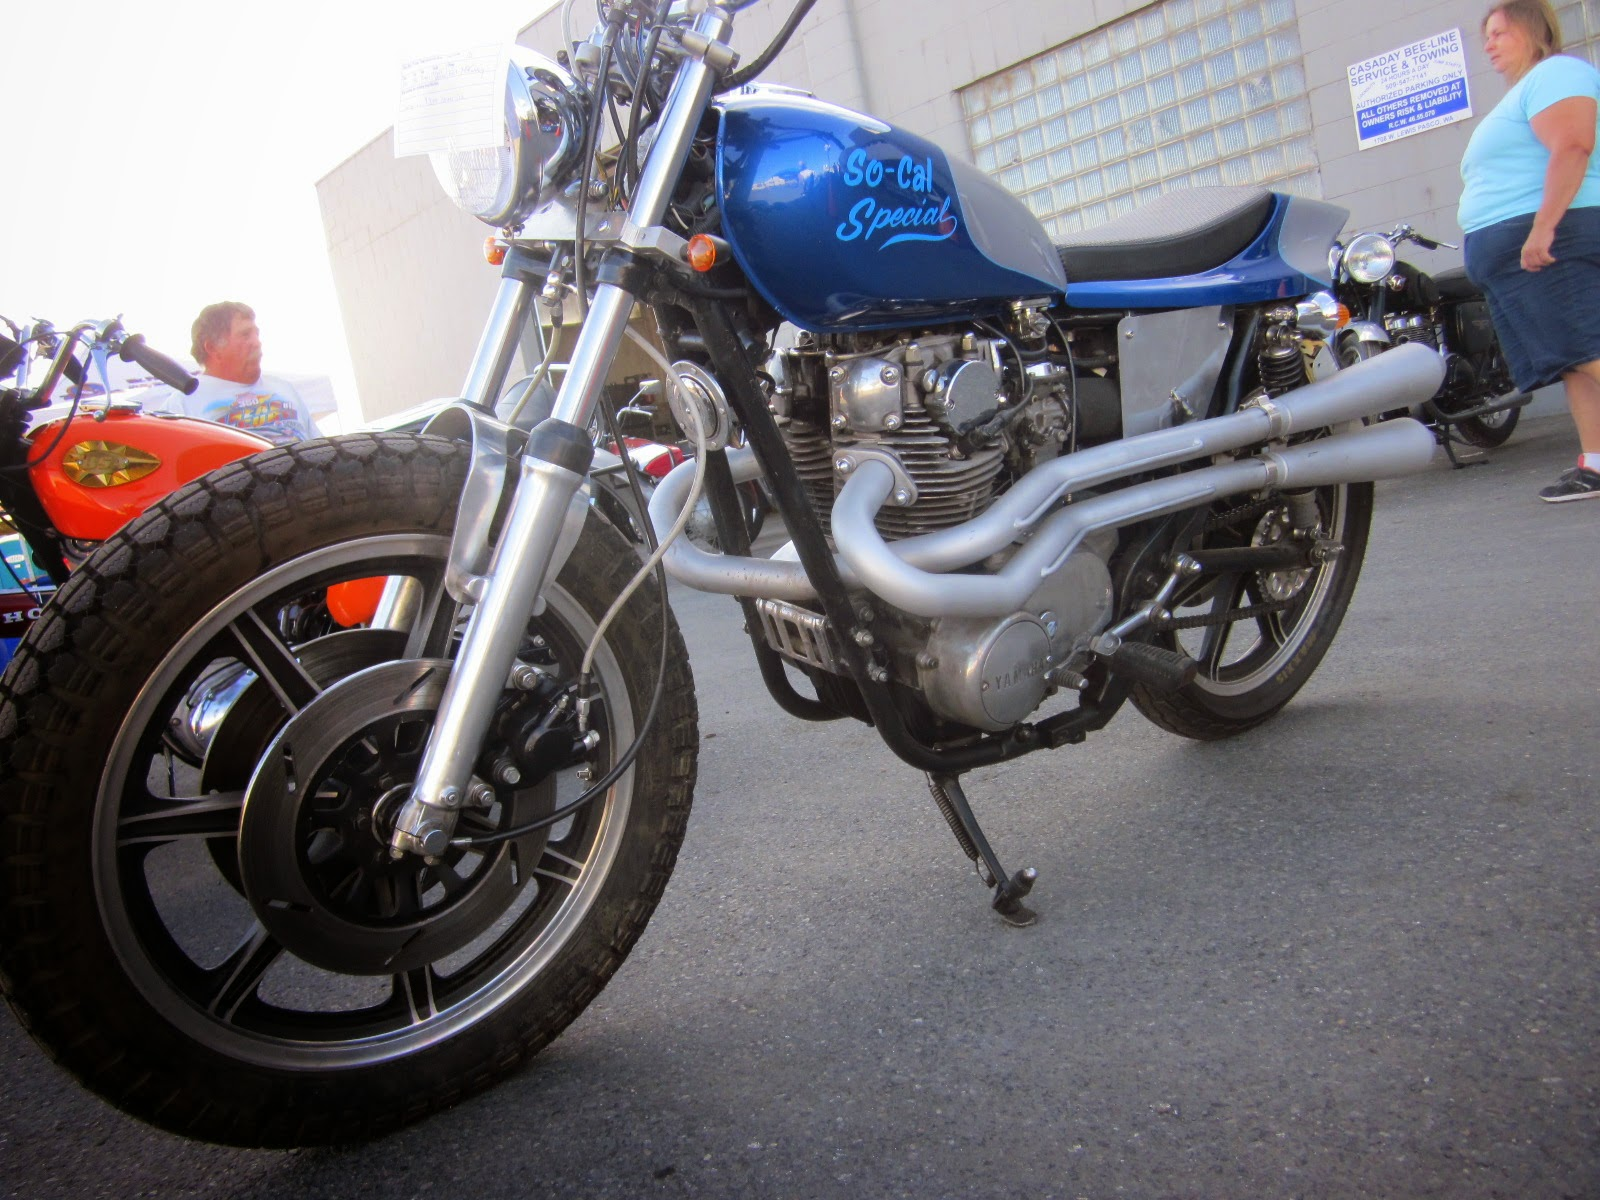 Oldmotodude  1980 Yamaha Xs650 Street Tracker On Display